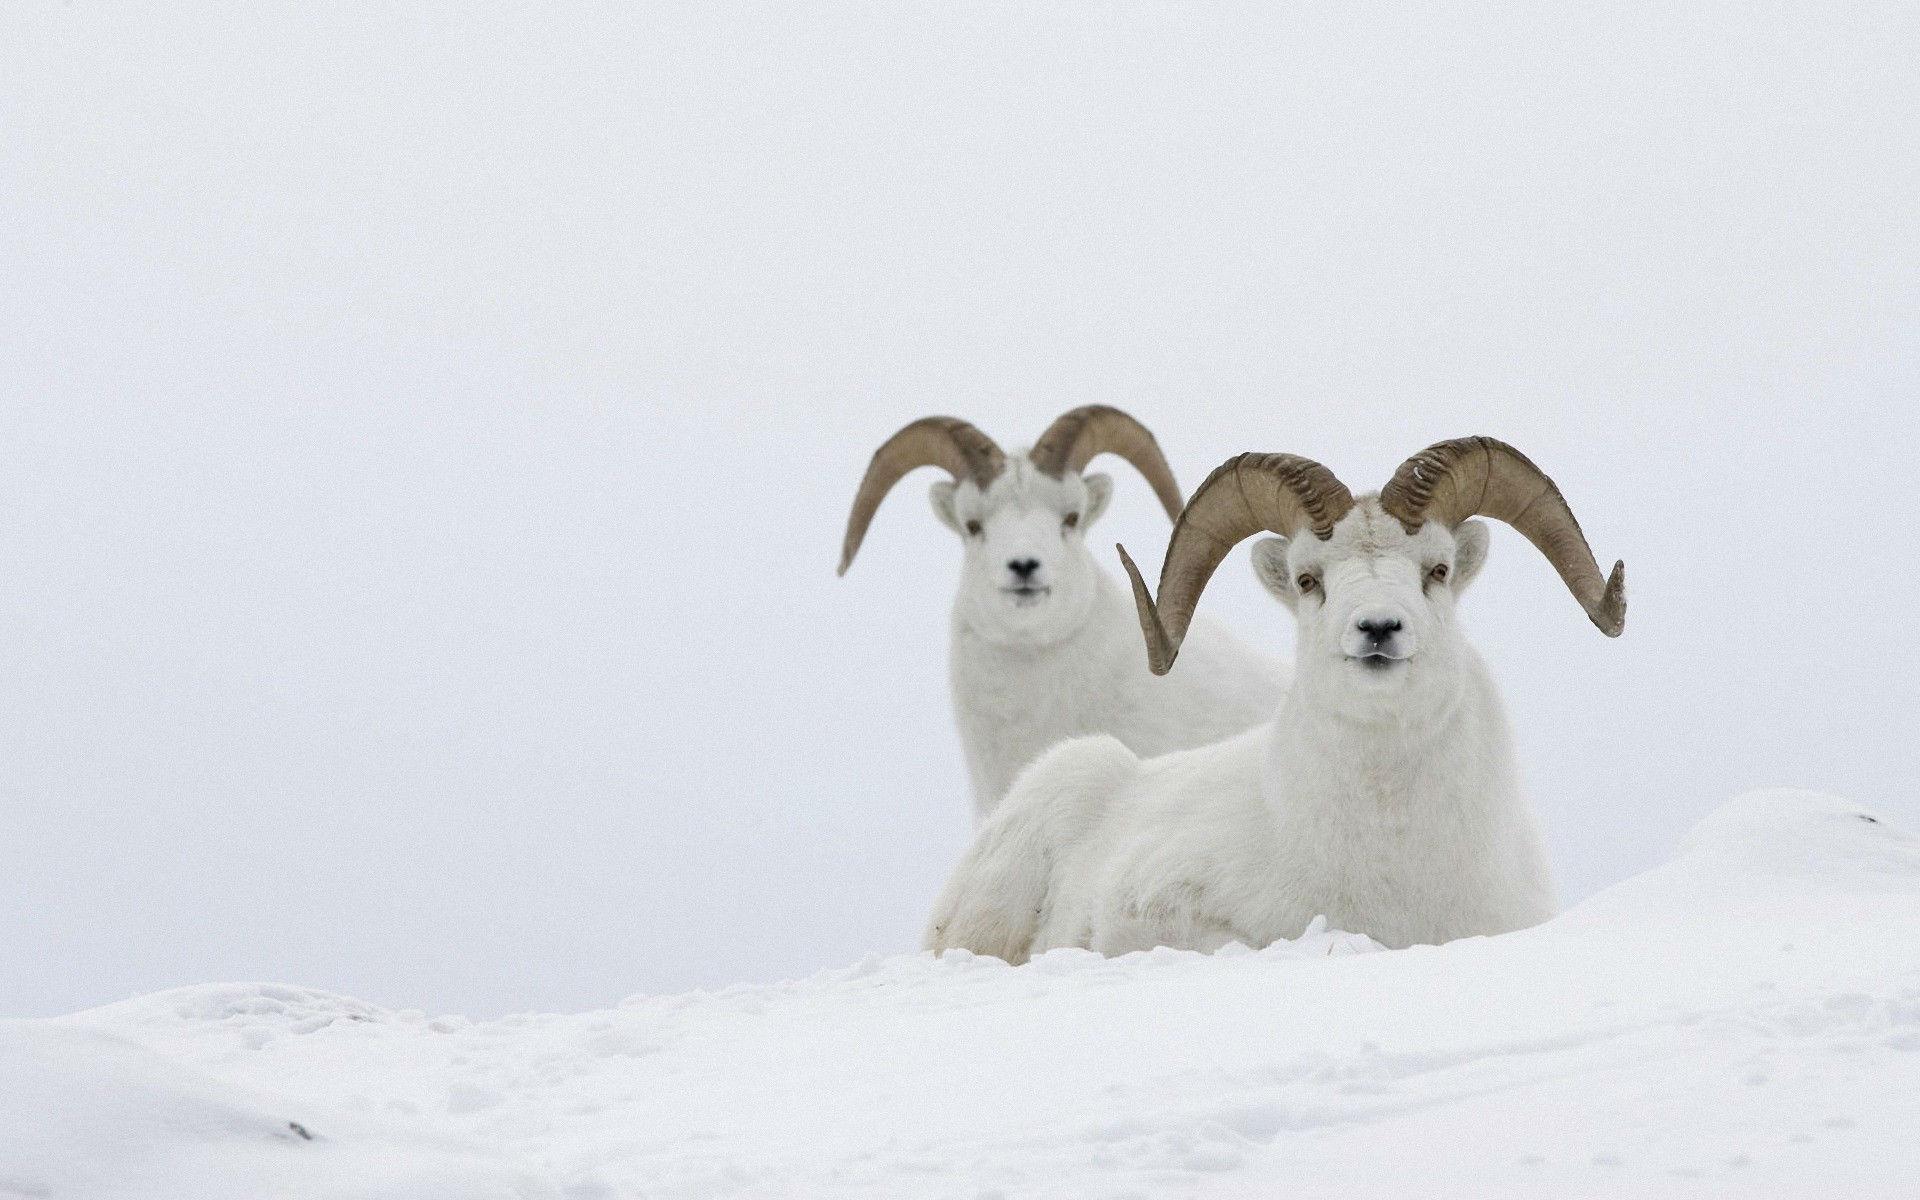 goat 17117